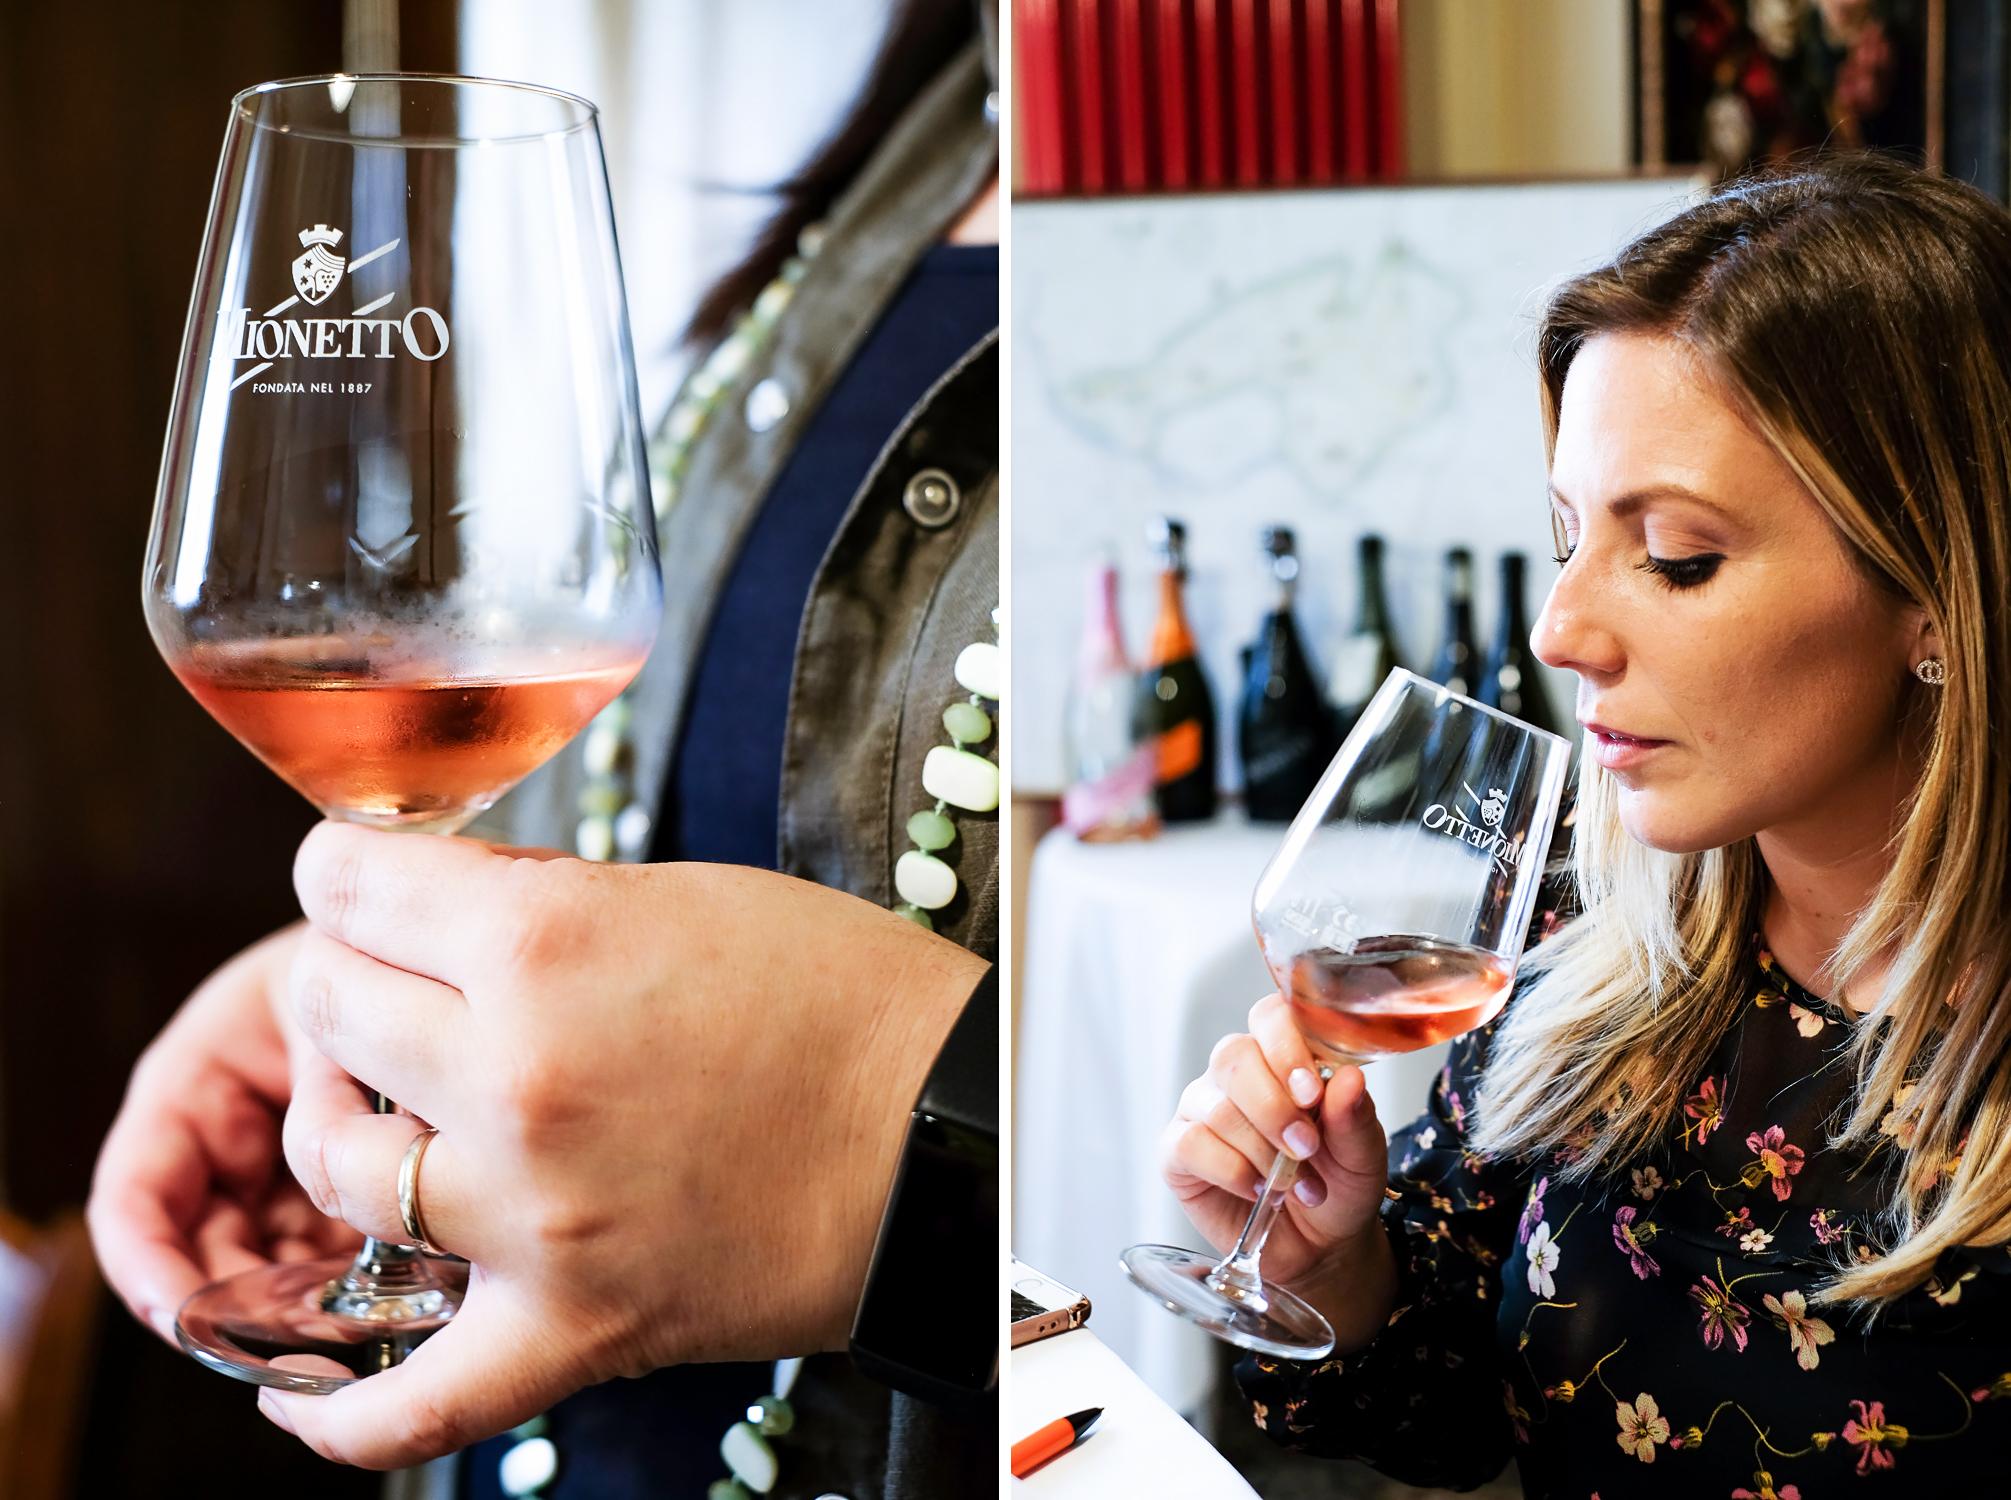 Mionetto Prosecco Rosé Extra Dry is a sparkling wine produced in Valdobbiadene in Veneto, Italy